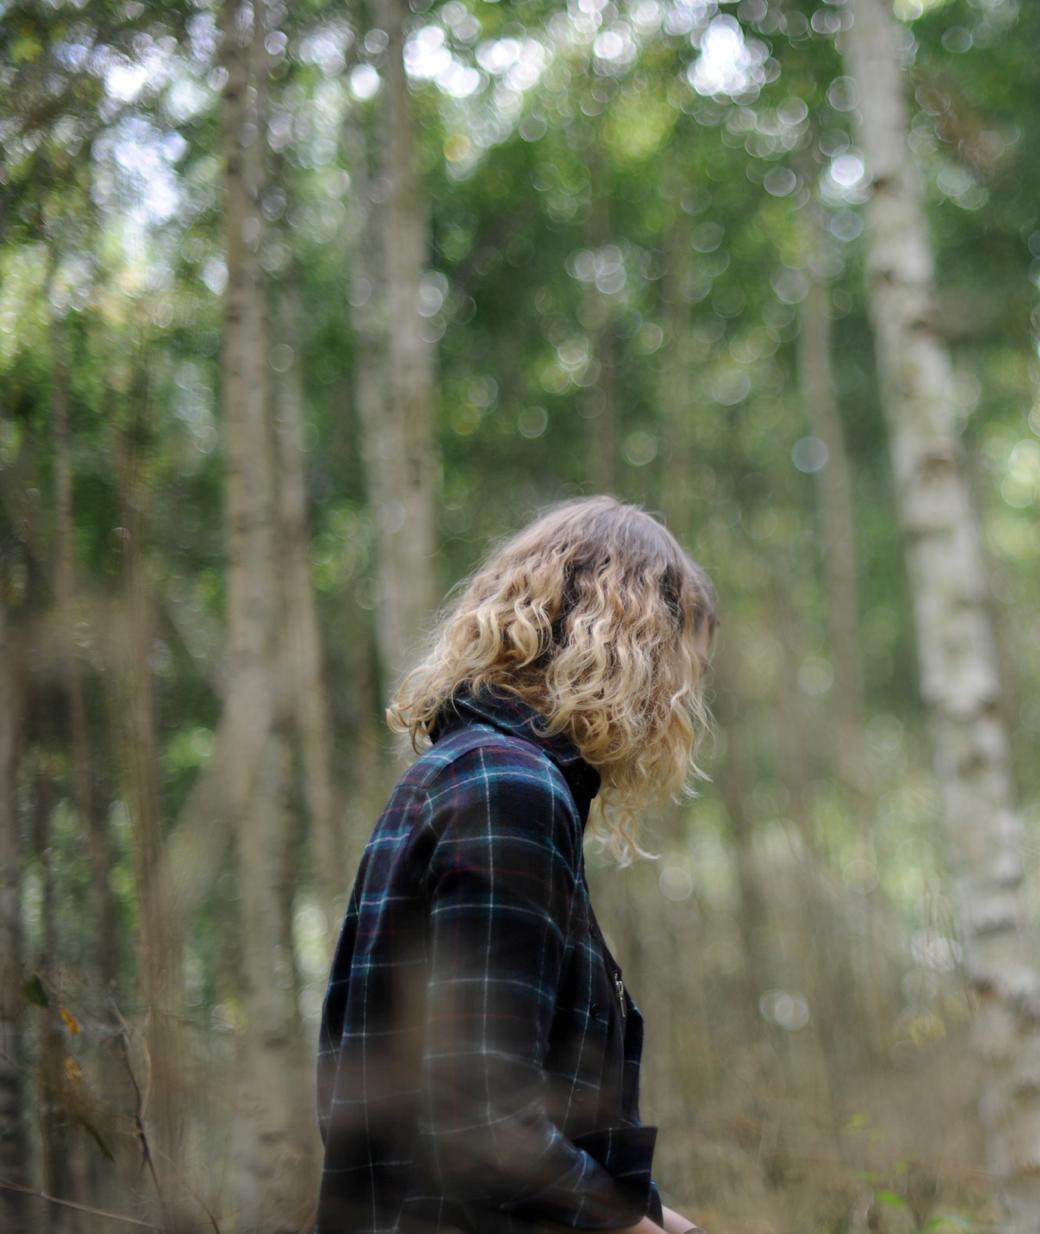 maybeyoulike_sweden_forest4